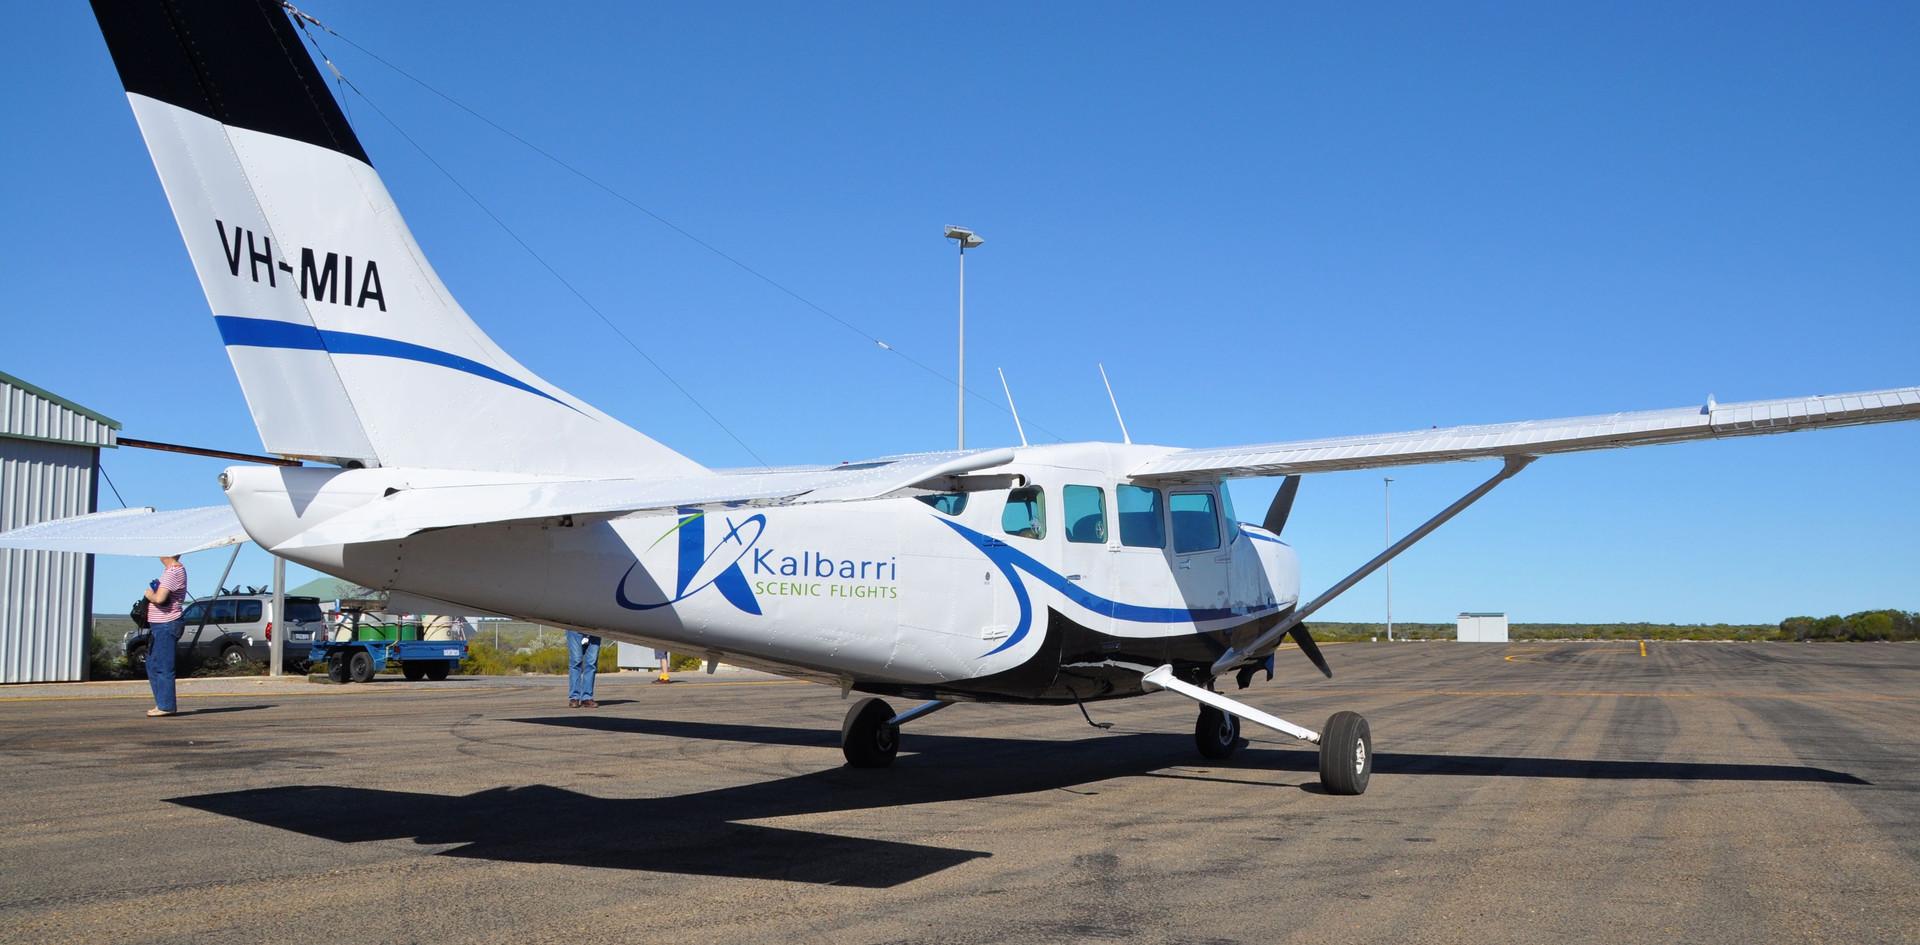 Nationwest Aviation and Kalbarri scenic flights Cessna 207